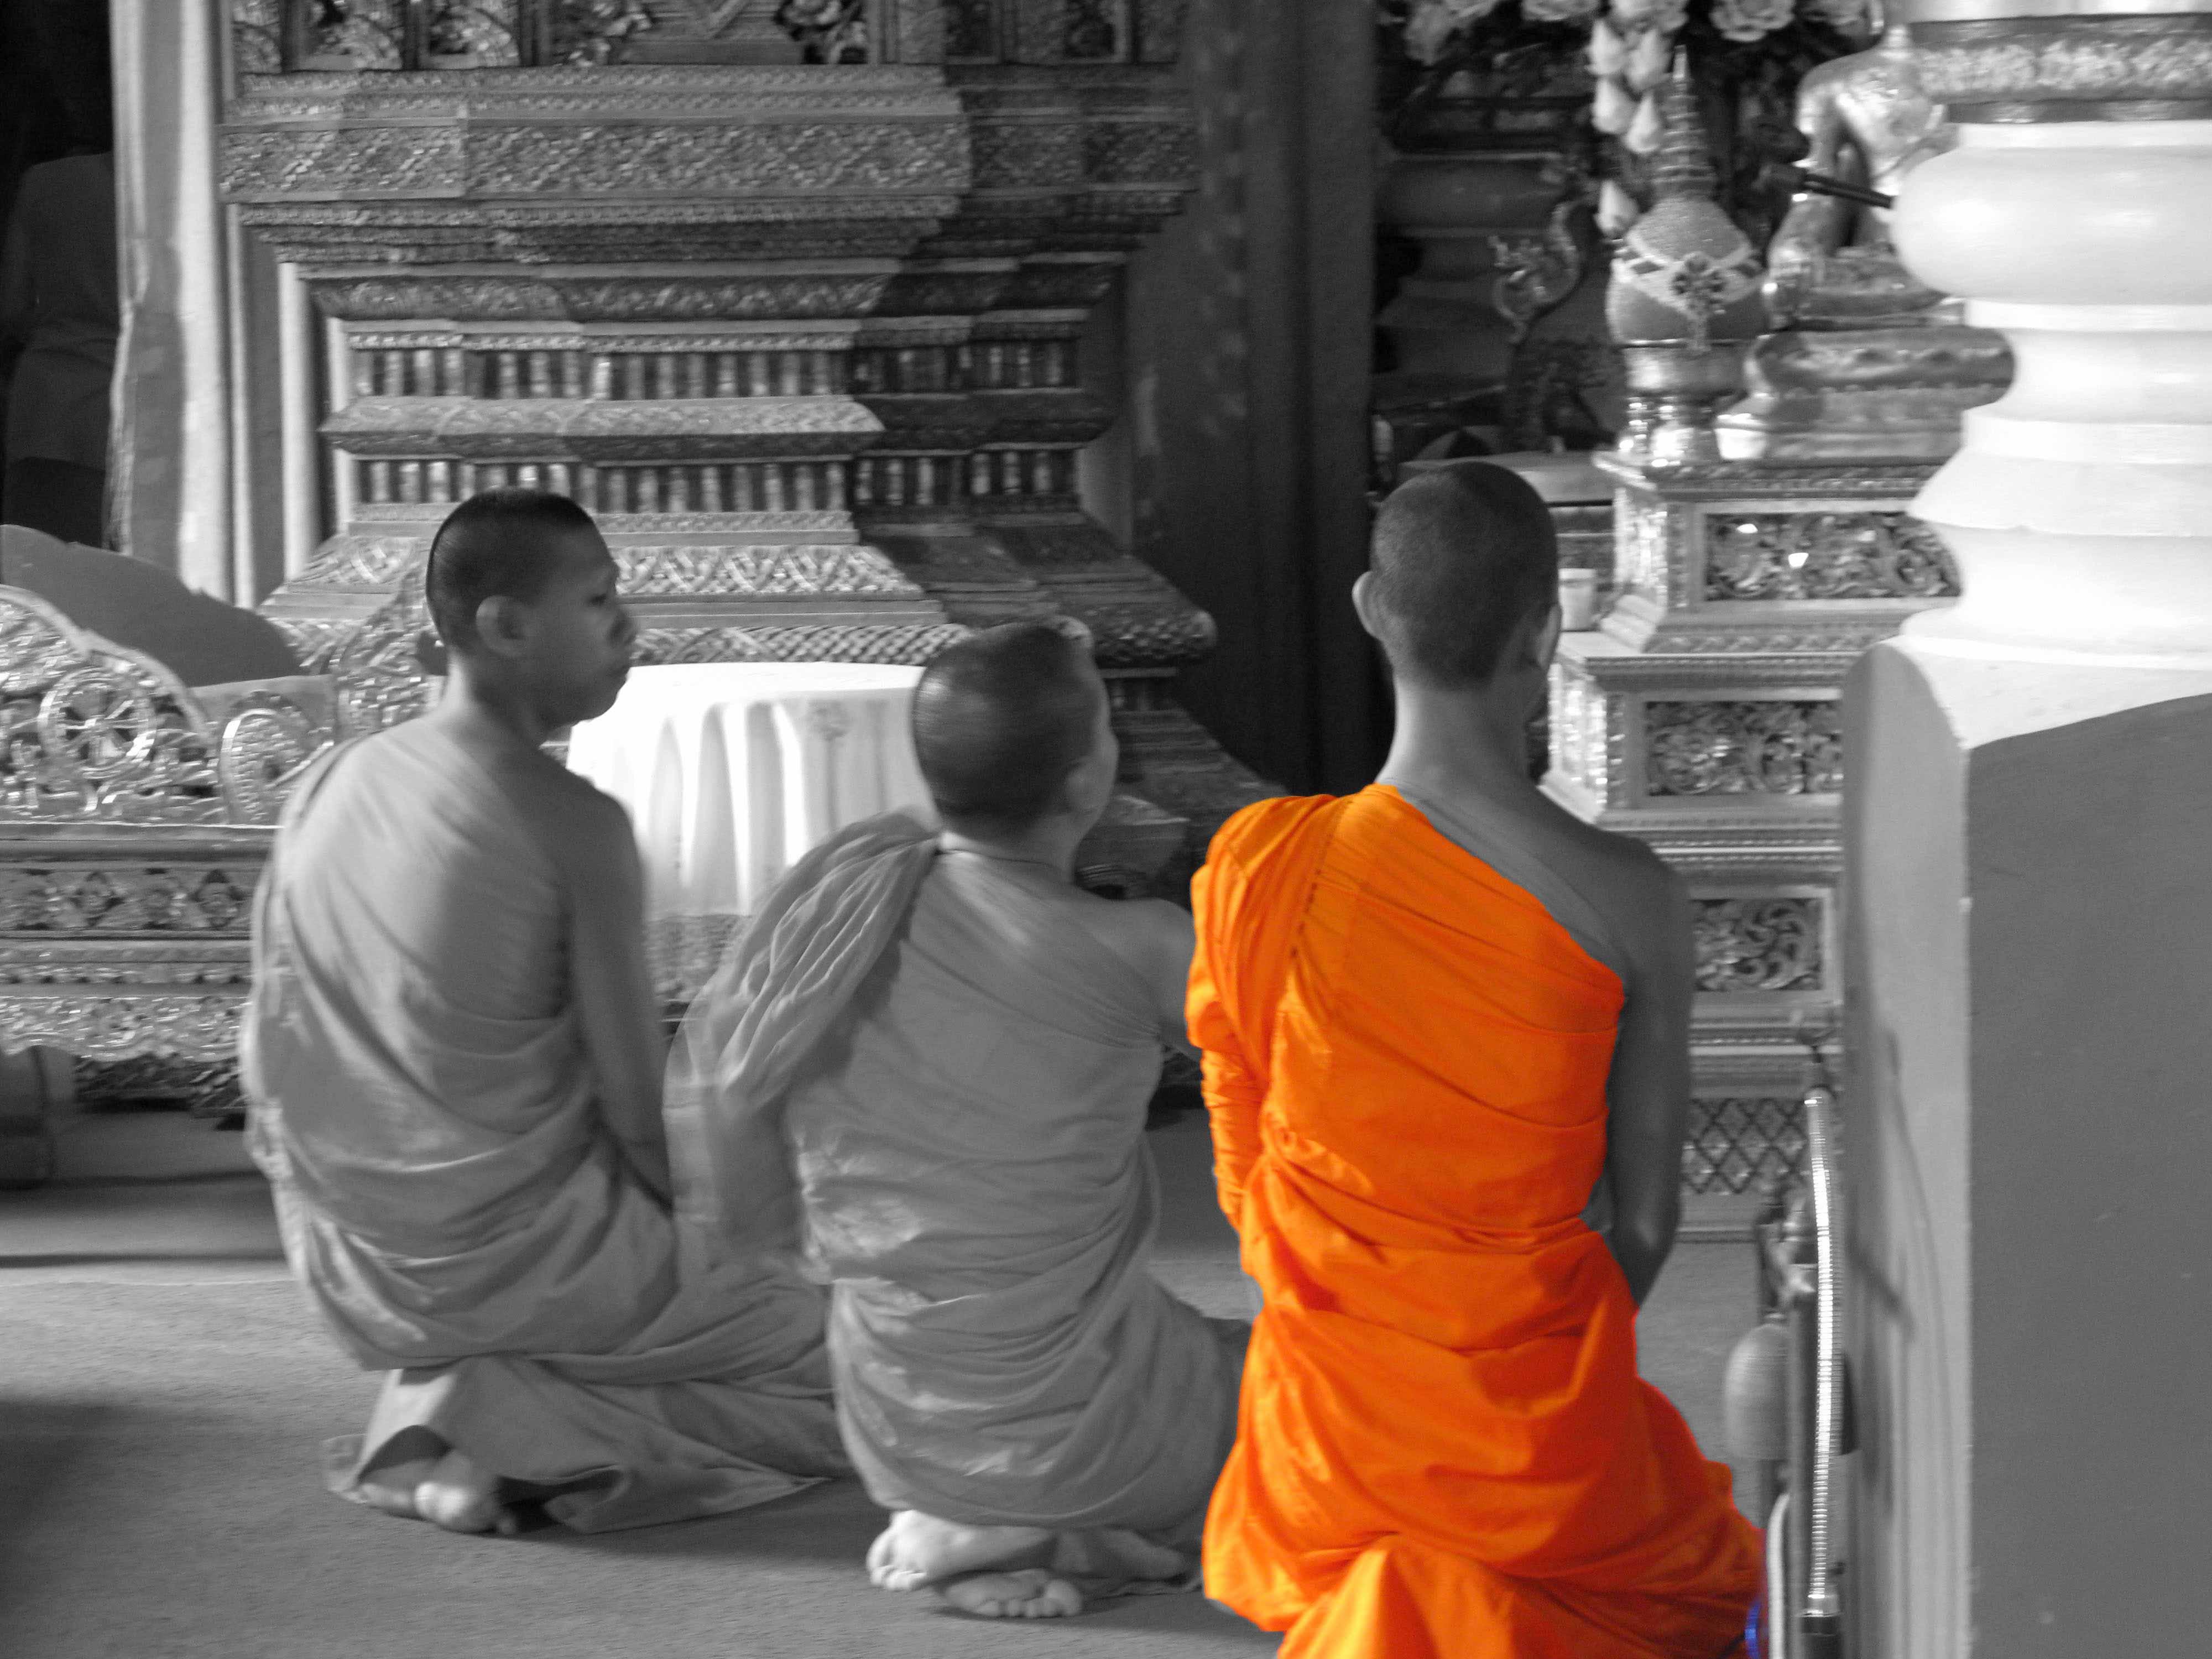 3 semaines en Thaïlande  3 semaines en Thaïlande  3 semaines en Thaïlande